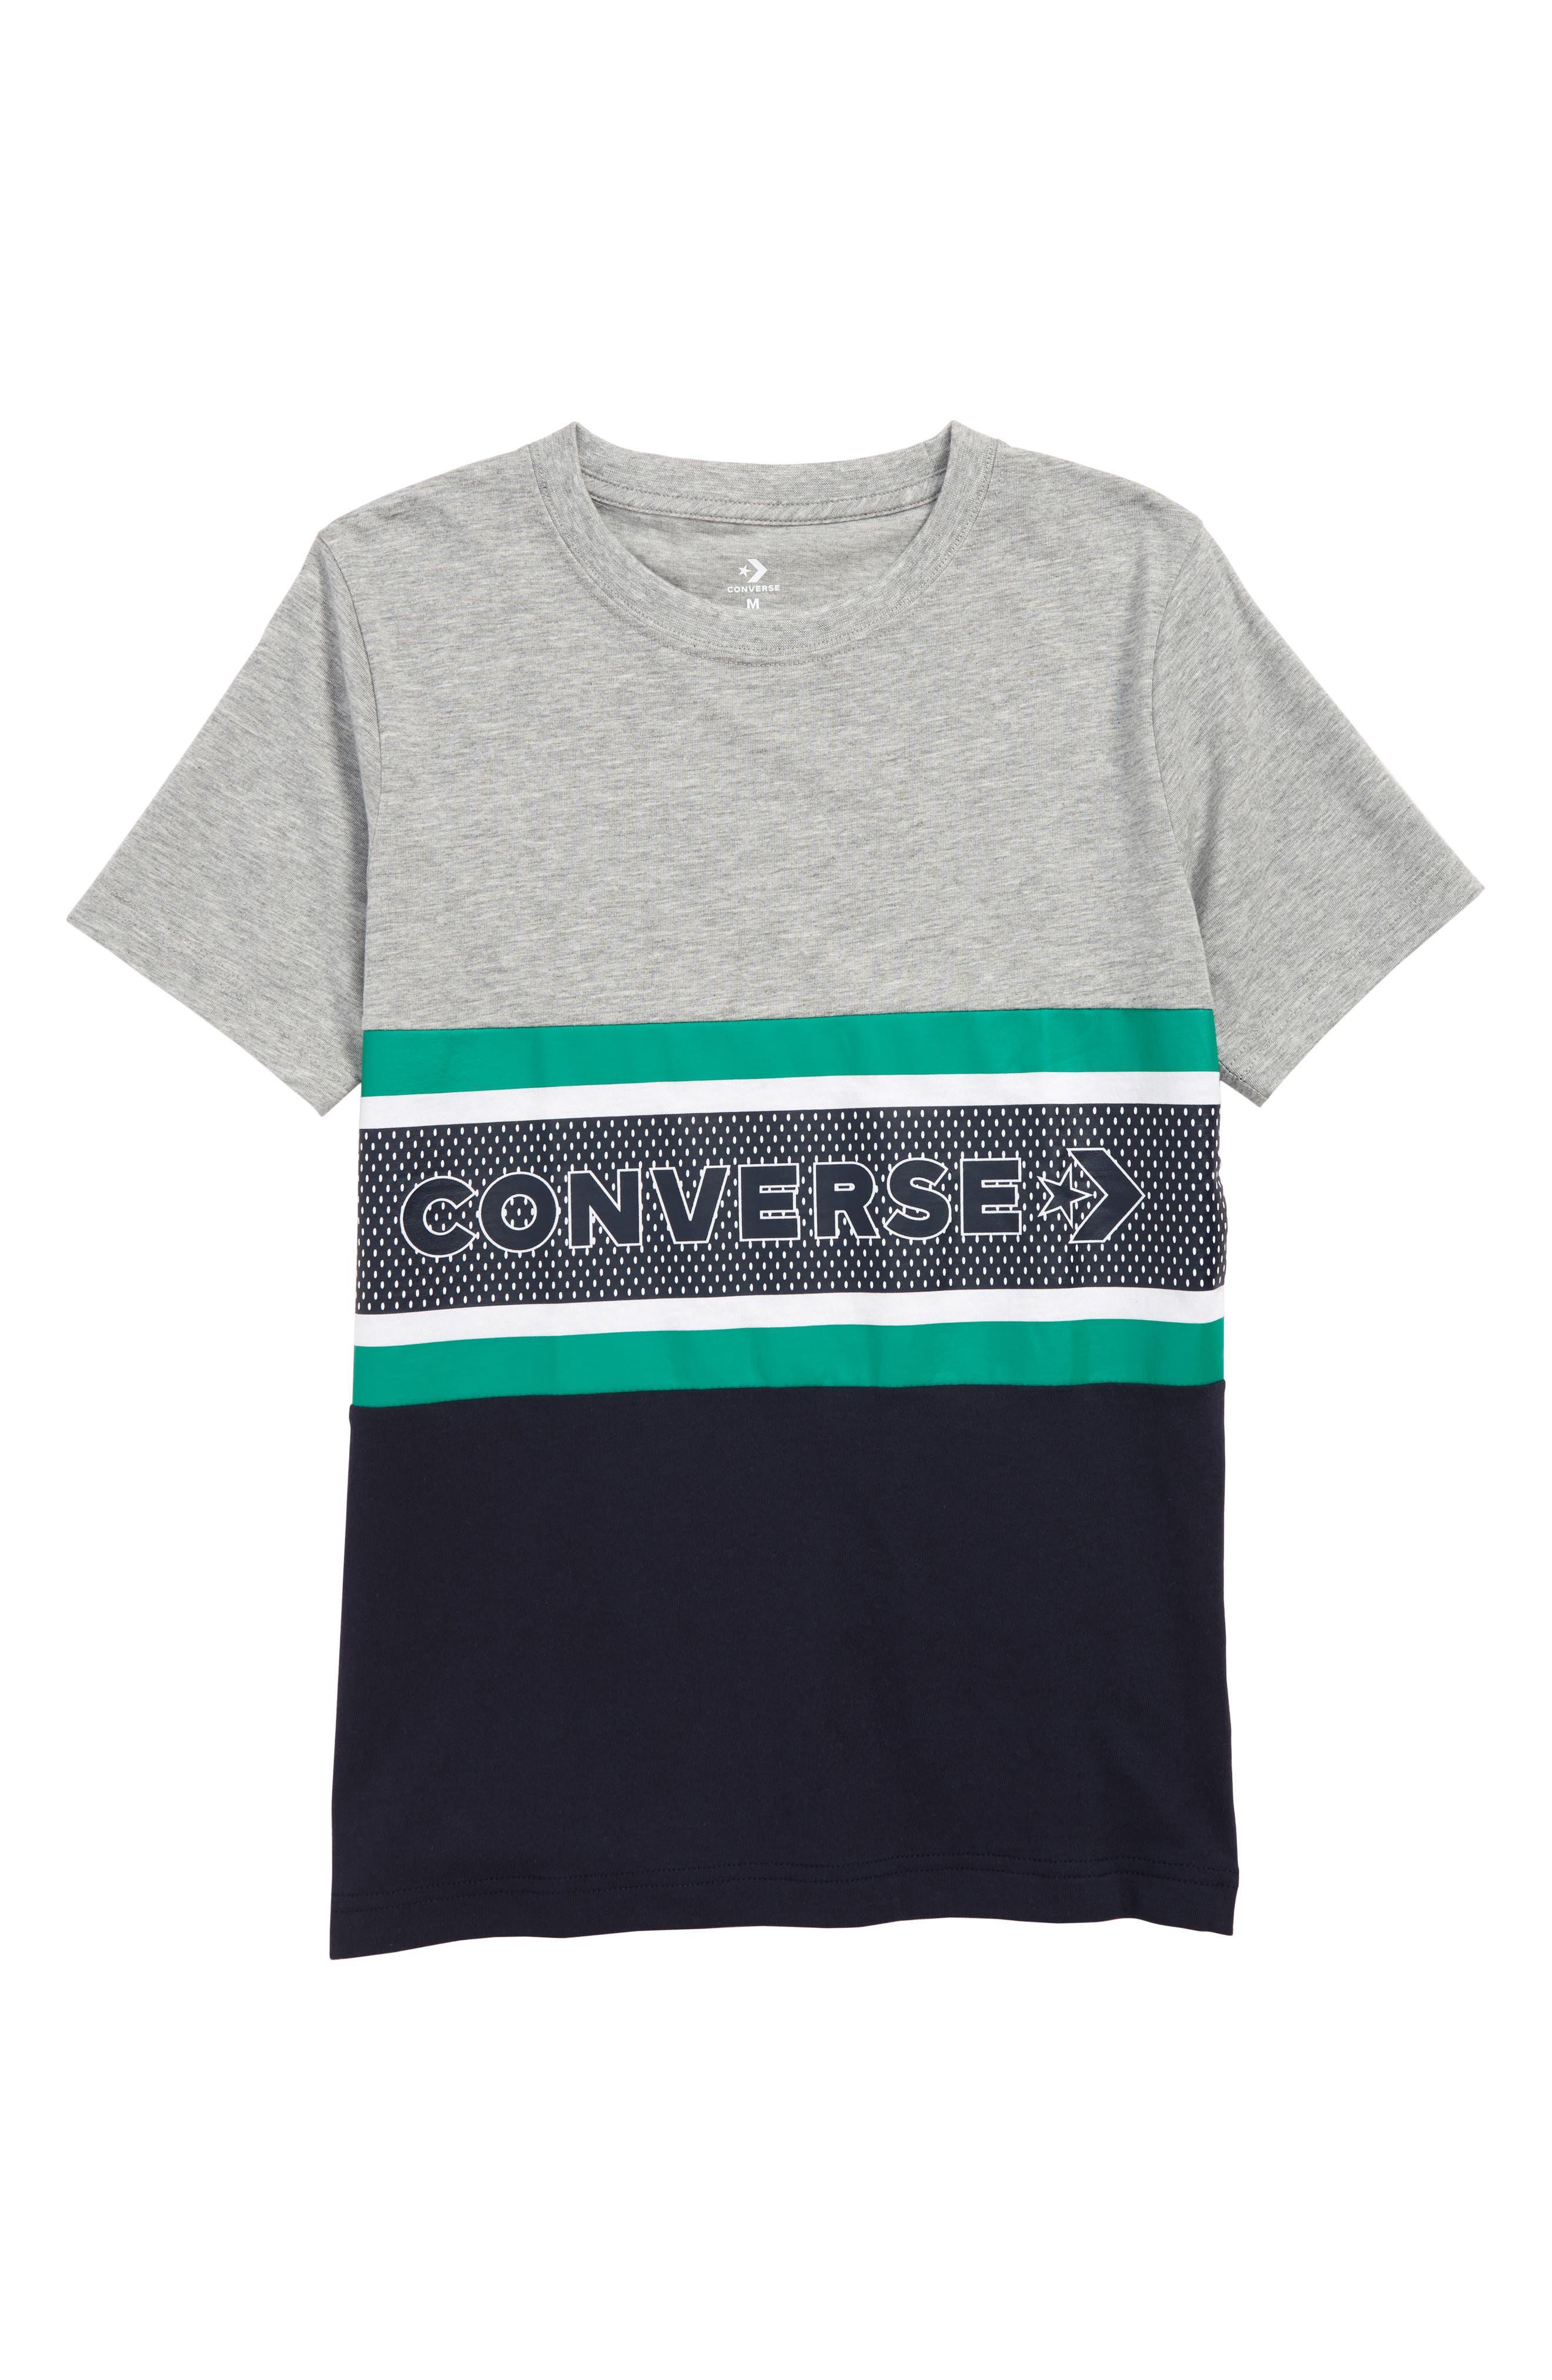 CONVERSE, Retro Striped T-Shirt, Main thumbnail 1, color, DARK GREY HEATHER